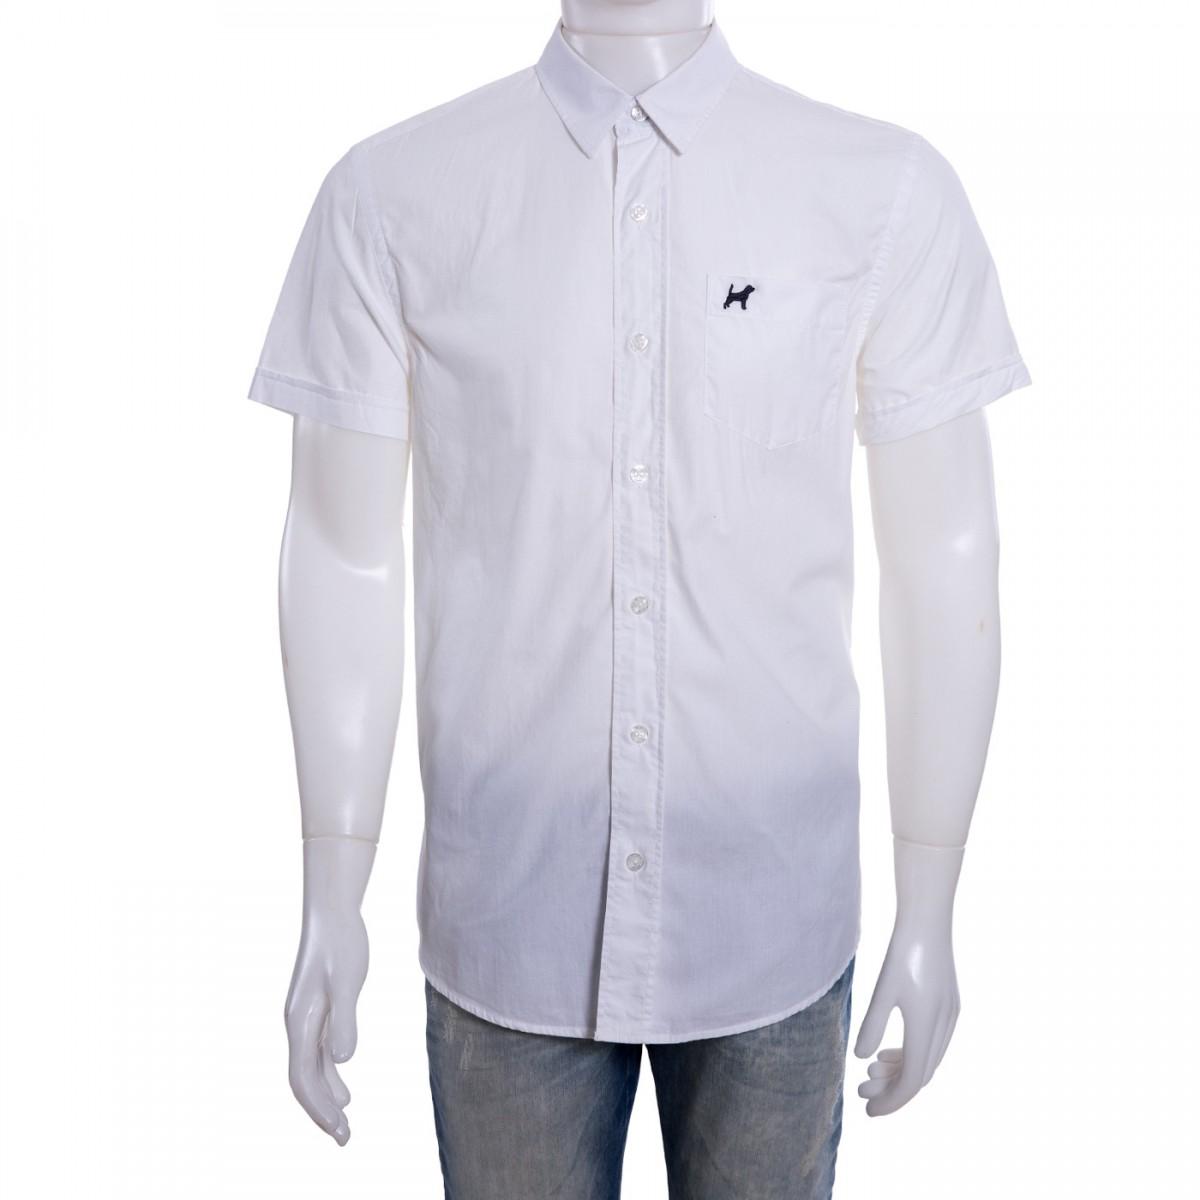 9a651b243e ... Bizz Store - Camisa Social Masculina Beagle Manga Curta Branca  c68bb4af16fc56 ...